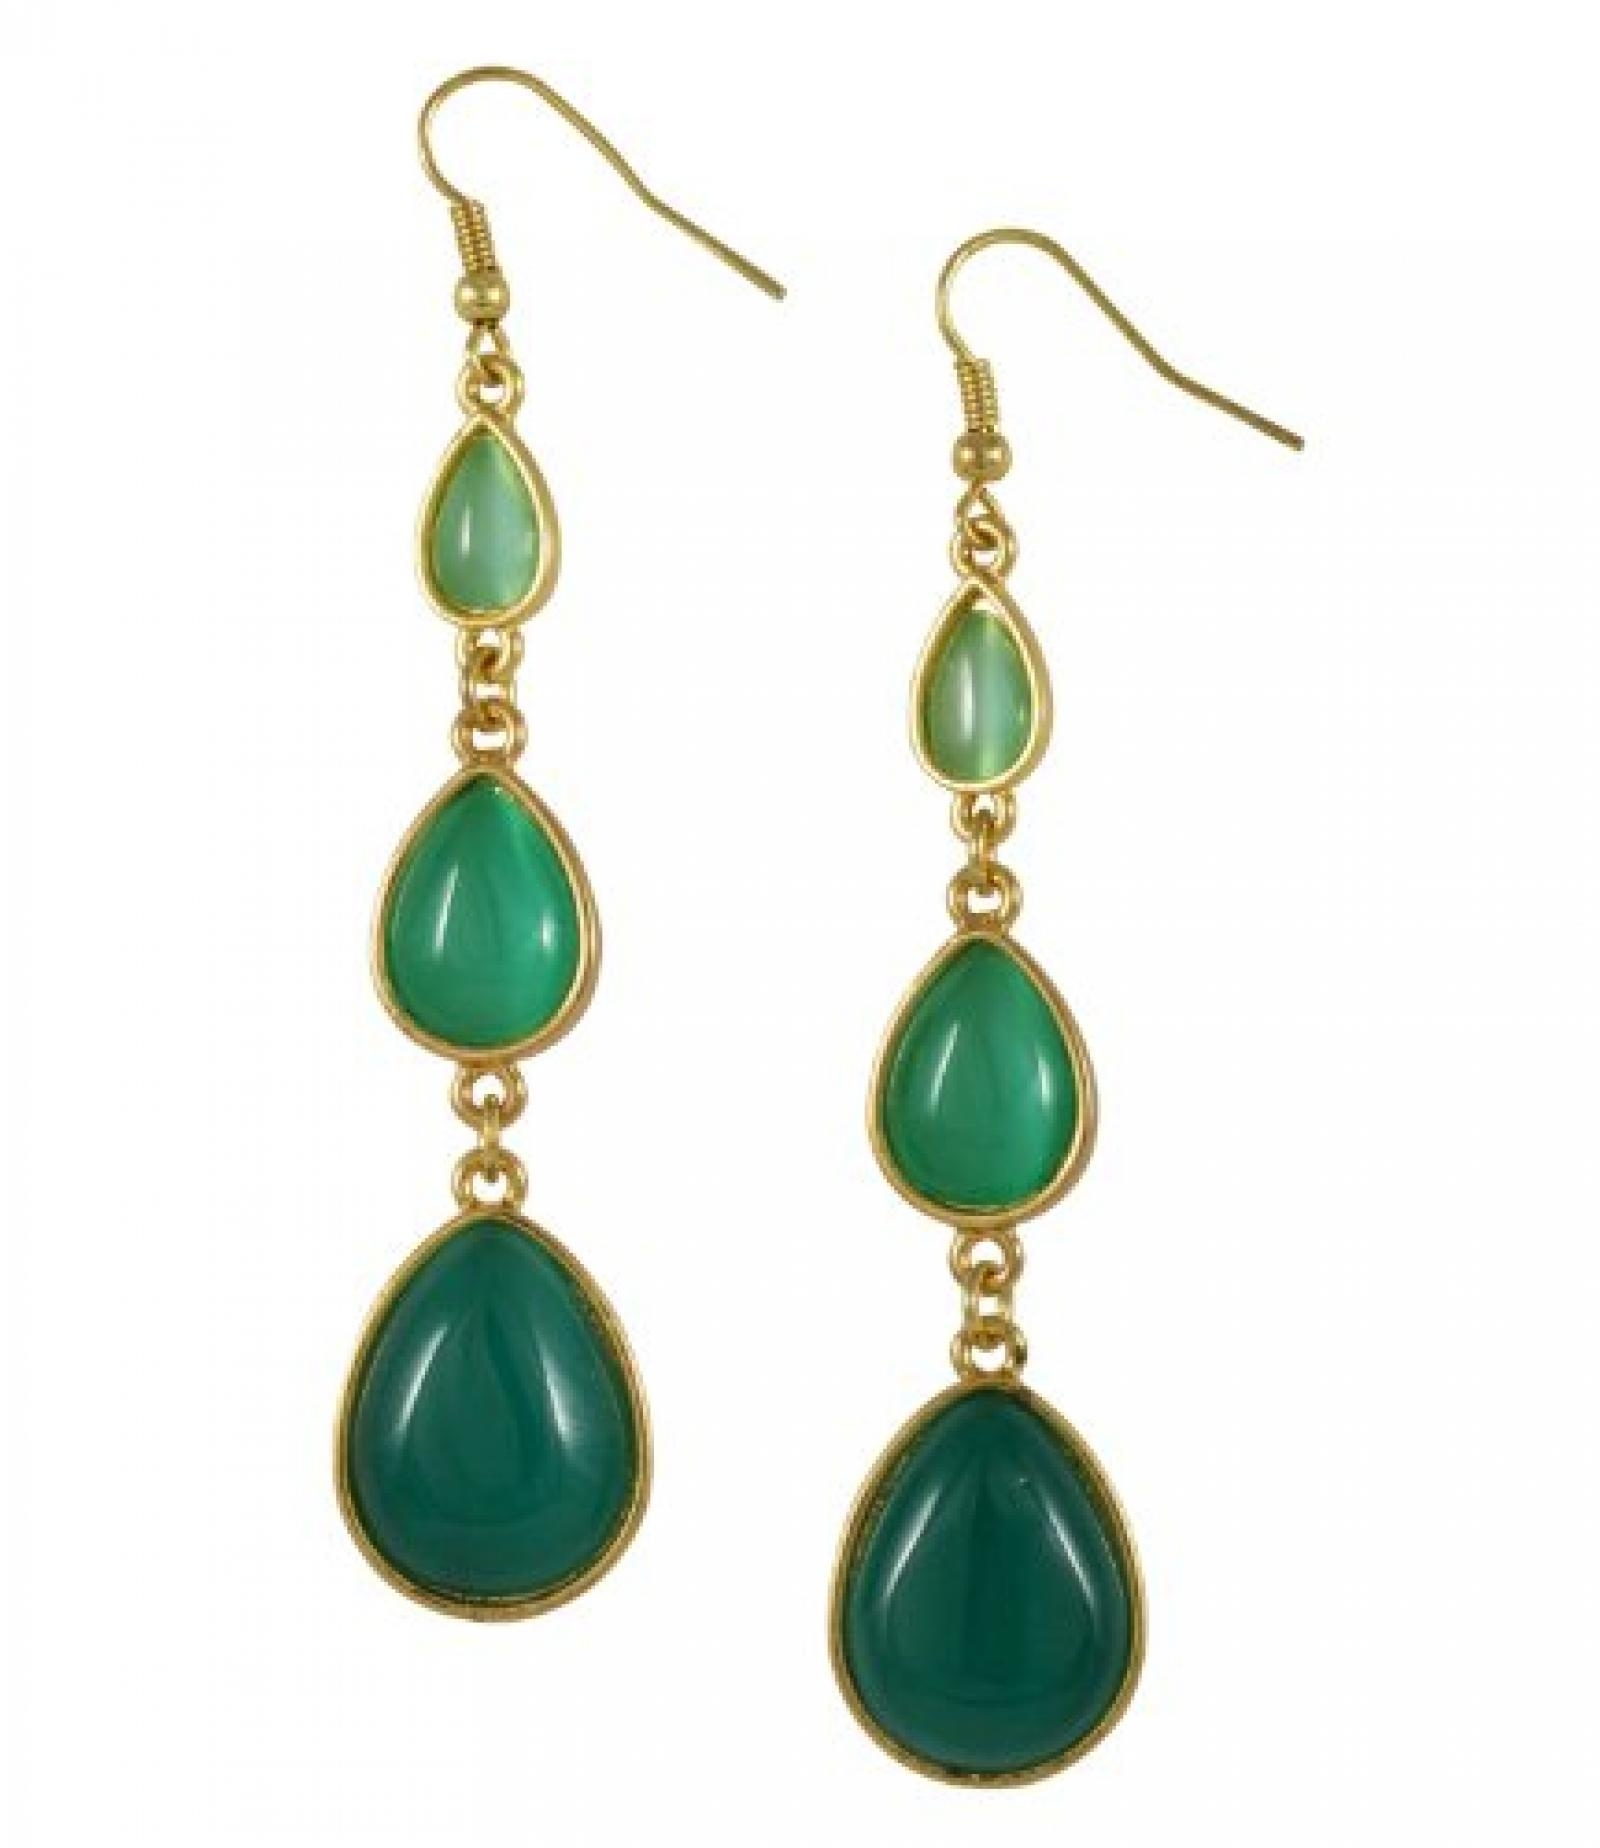 "SIX ""Gold & Green"" lange, goldene Ohrhänger mit grünen Tropfen (343-837)"